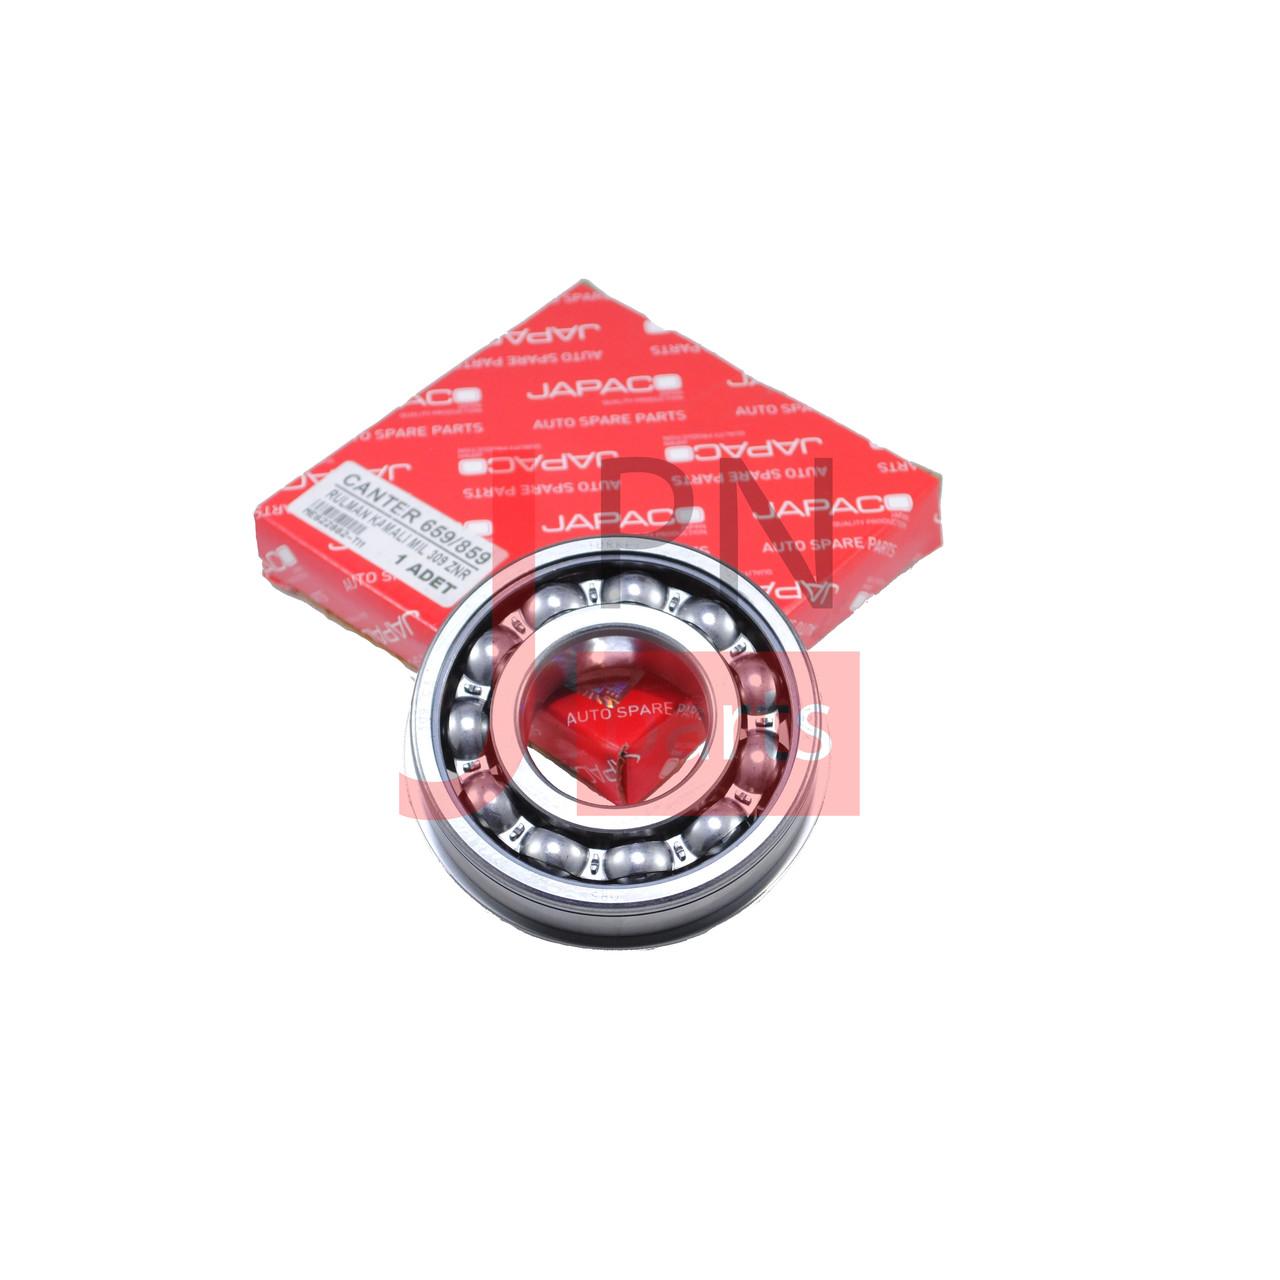 Подшипник вторичного вала КПП MITSUBISHI CANTER FUSO 659/859 (ME622882/ME623084/6309NRC3) JAPACO